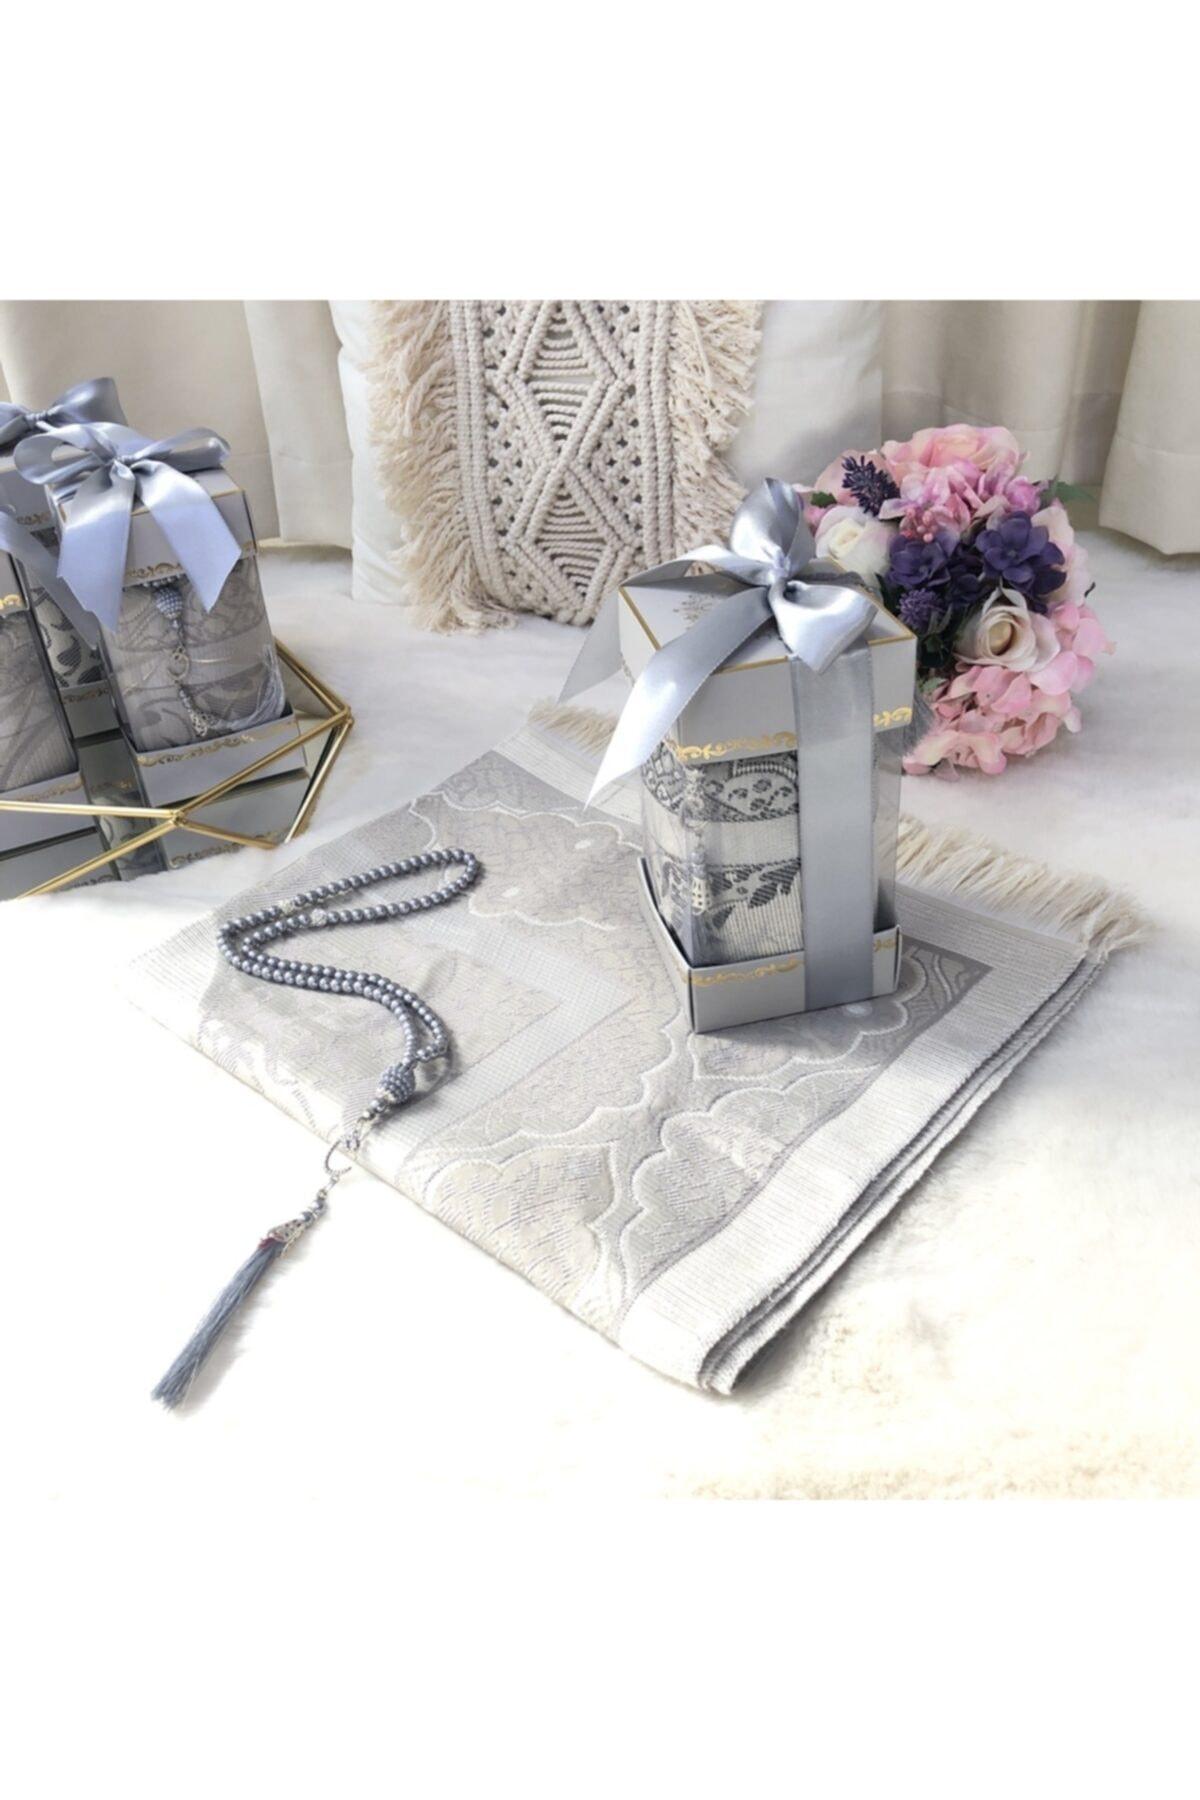 set-regalo-rosario-tappeto-preghiera-bebe-regalo-islamico-musulmano